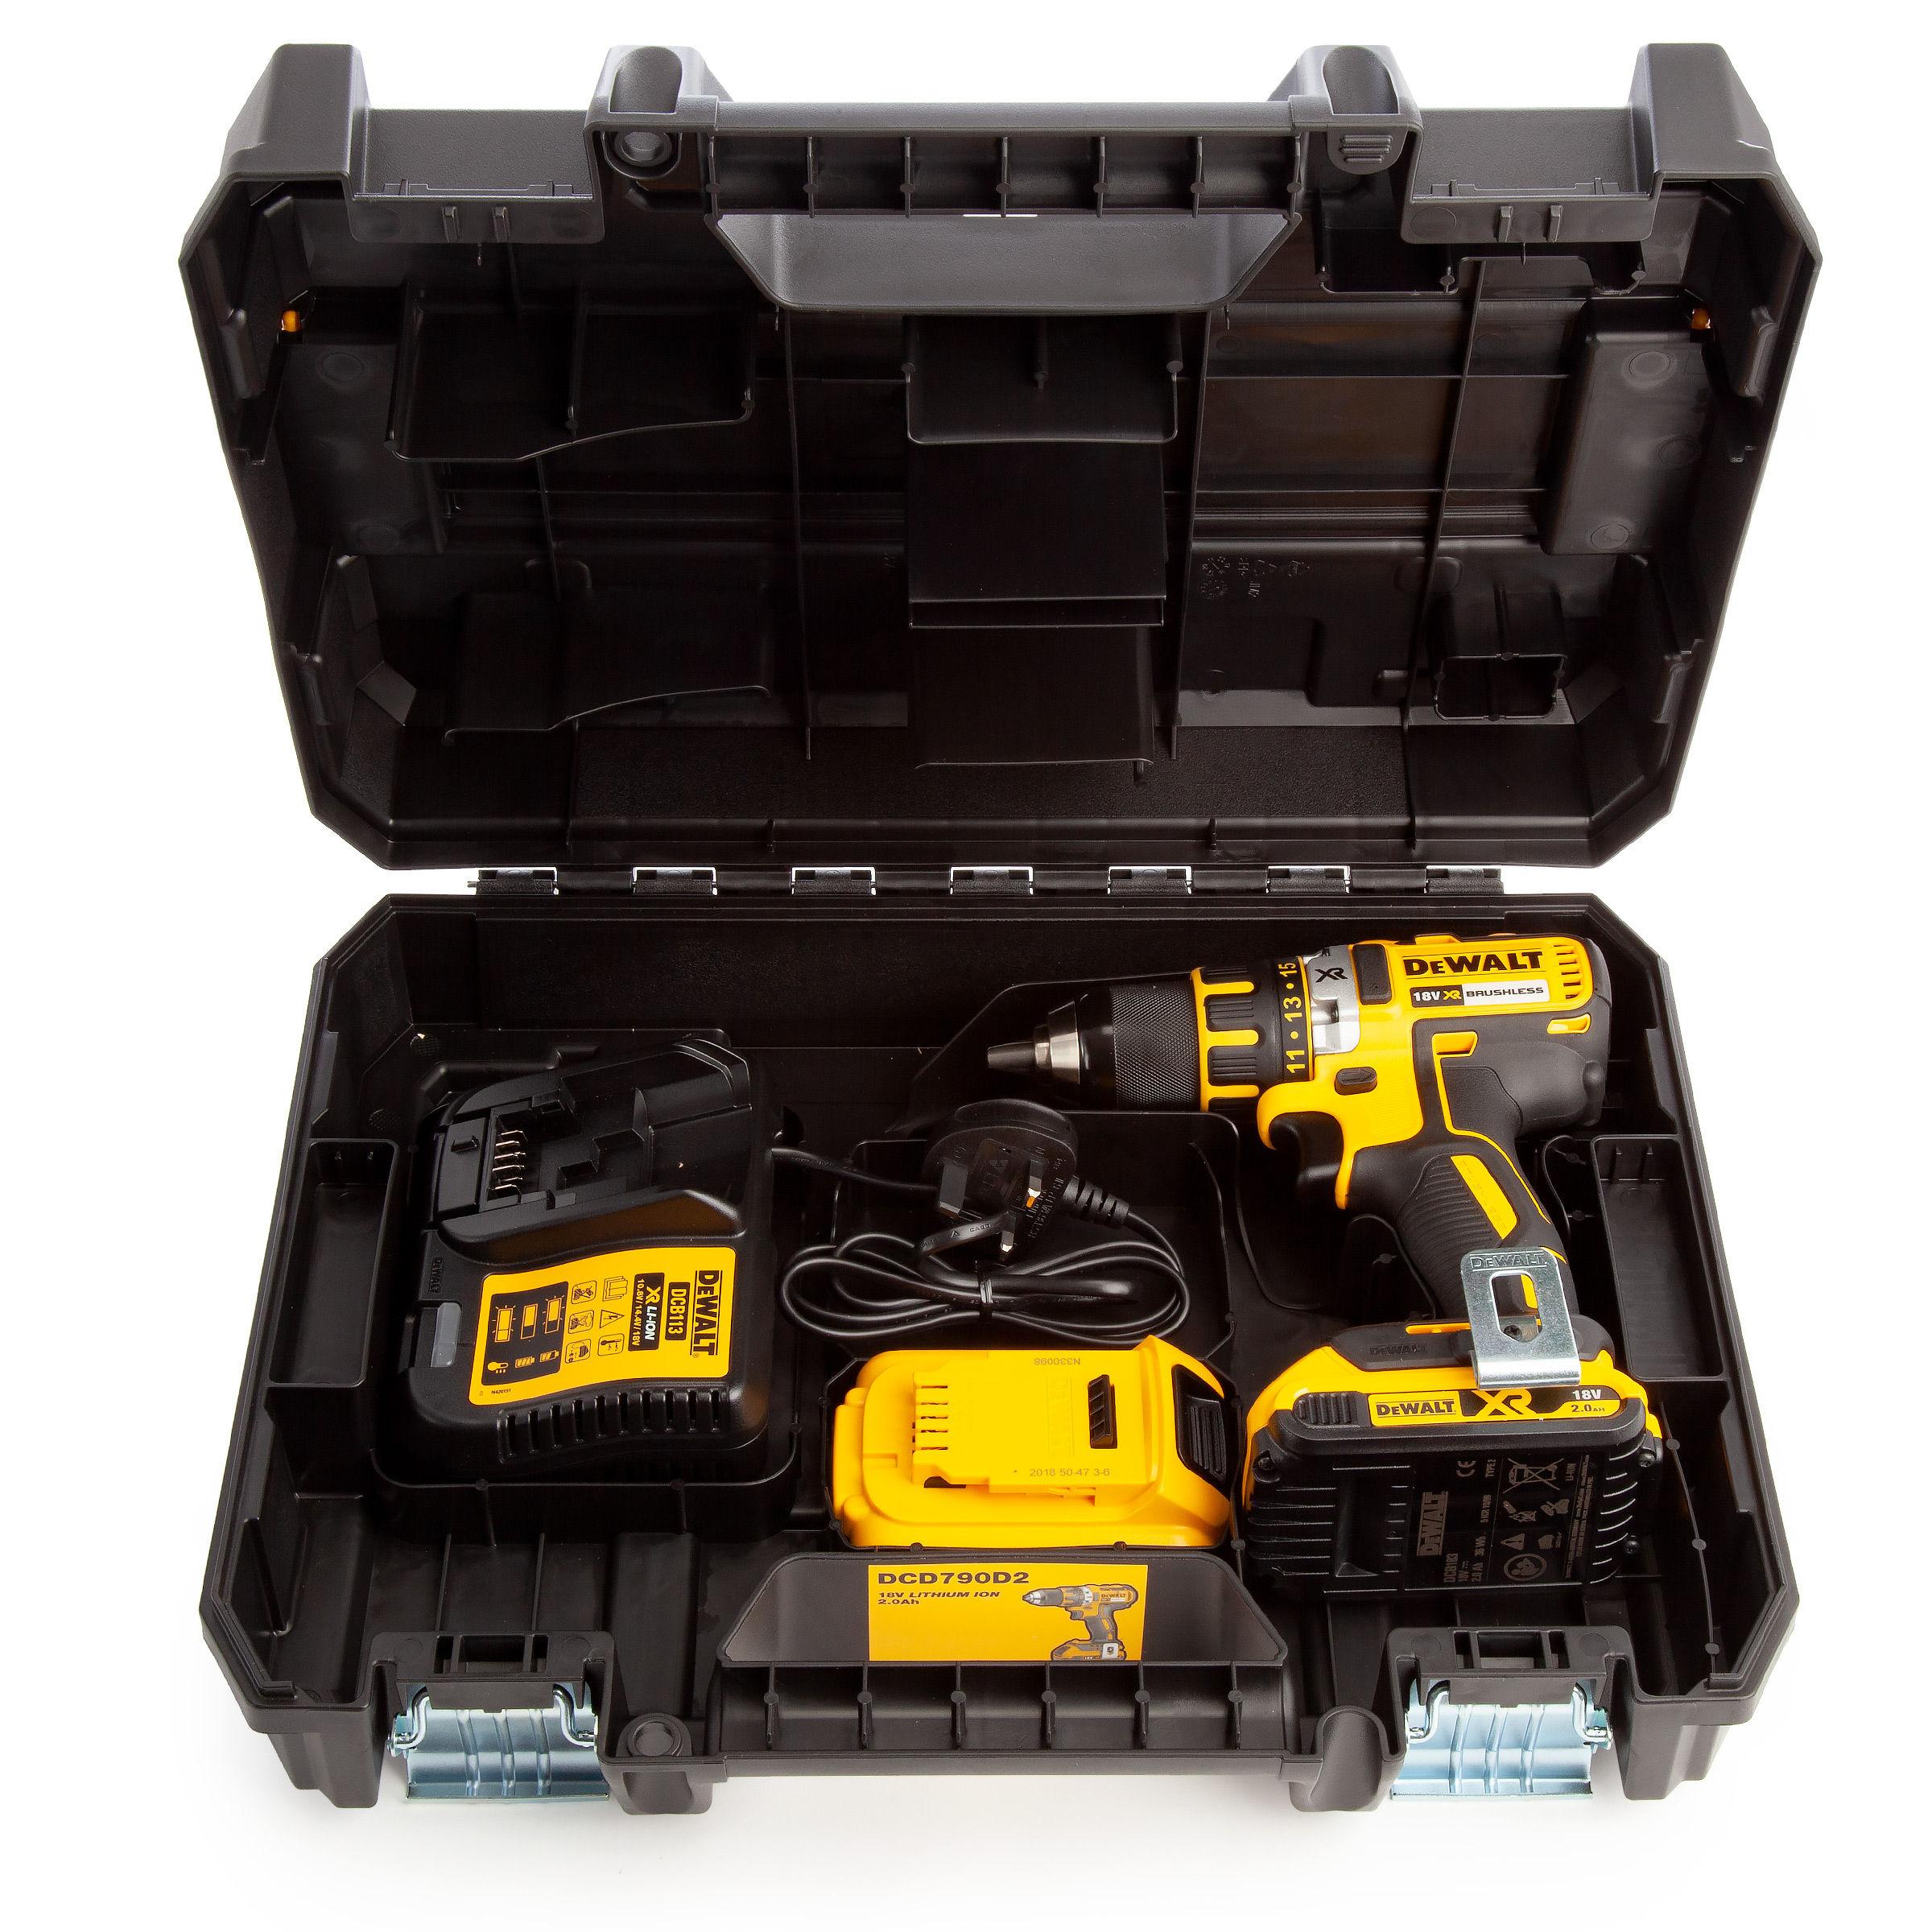 Underbar Toolstop Dewalt DCD790D2 18V XR Brushless Compact Drill Driver (2 PZ-77